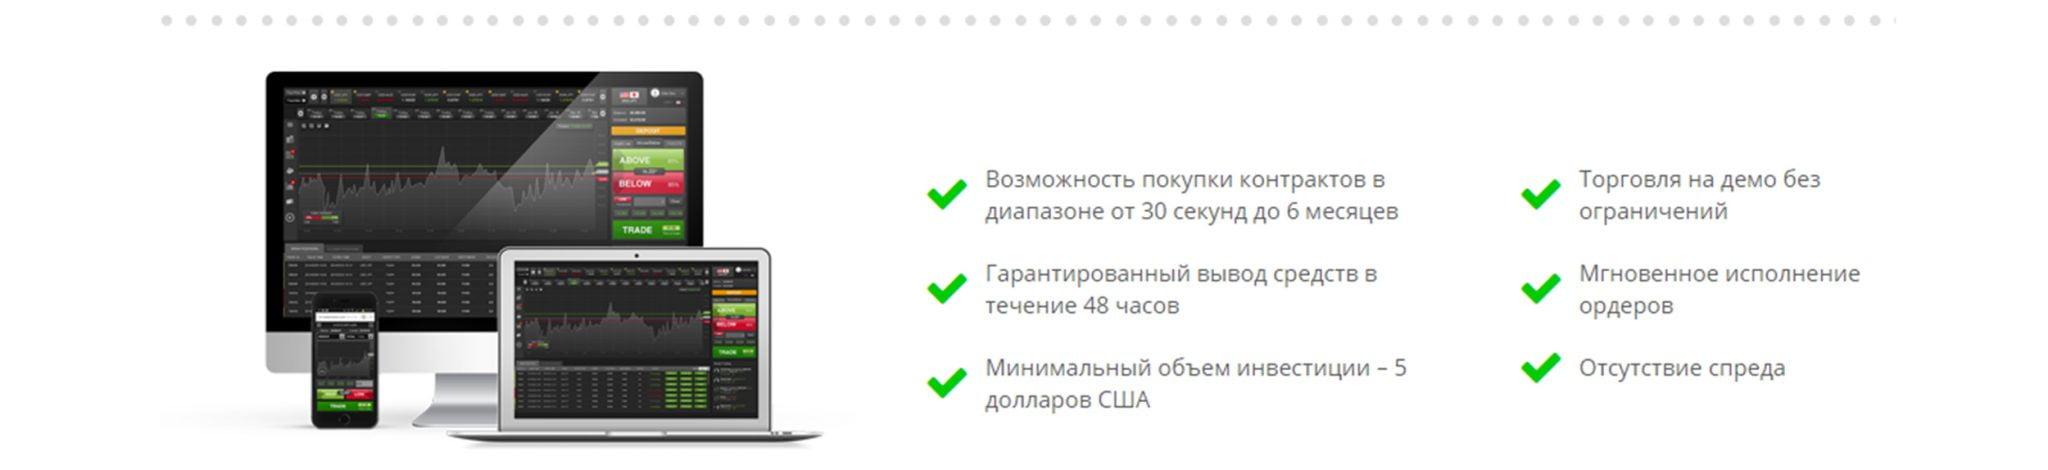 Преимущества компании FinMax